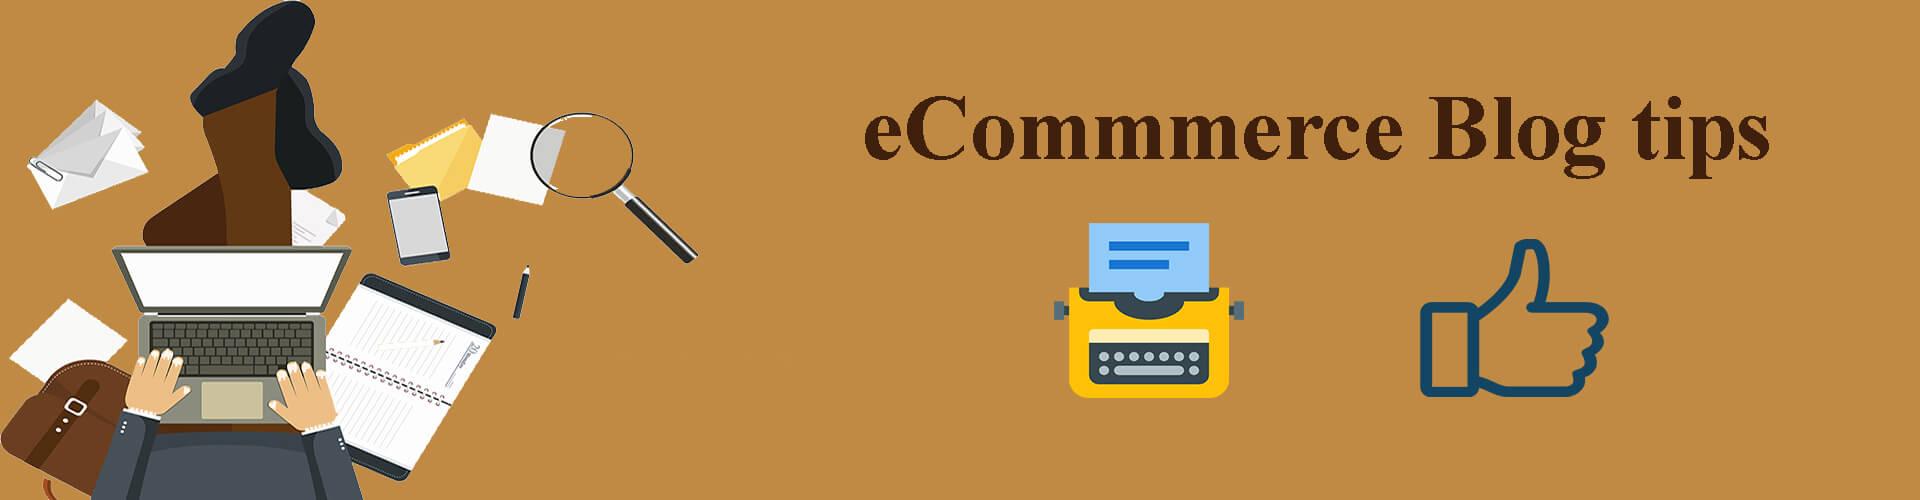 blog for eCommerce tips